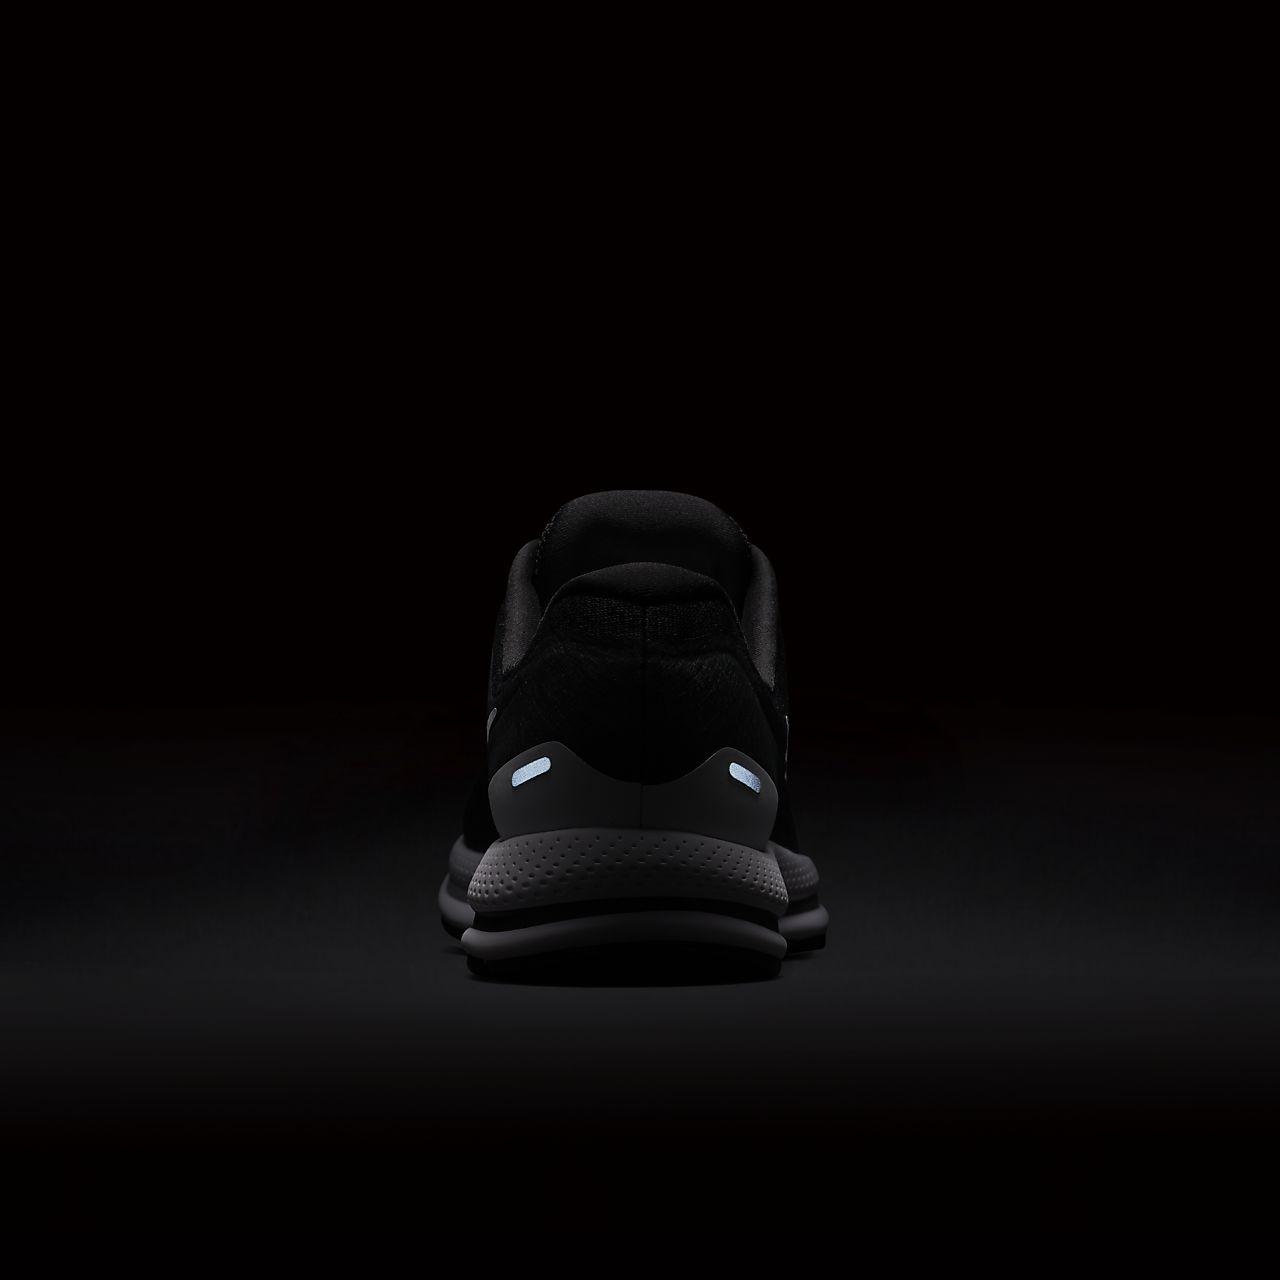 brand new 317b0 ecb16 ... Chaussure de running Nike Air Zoom Vomero 13 pour Femme